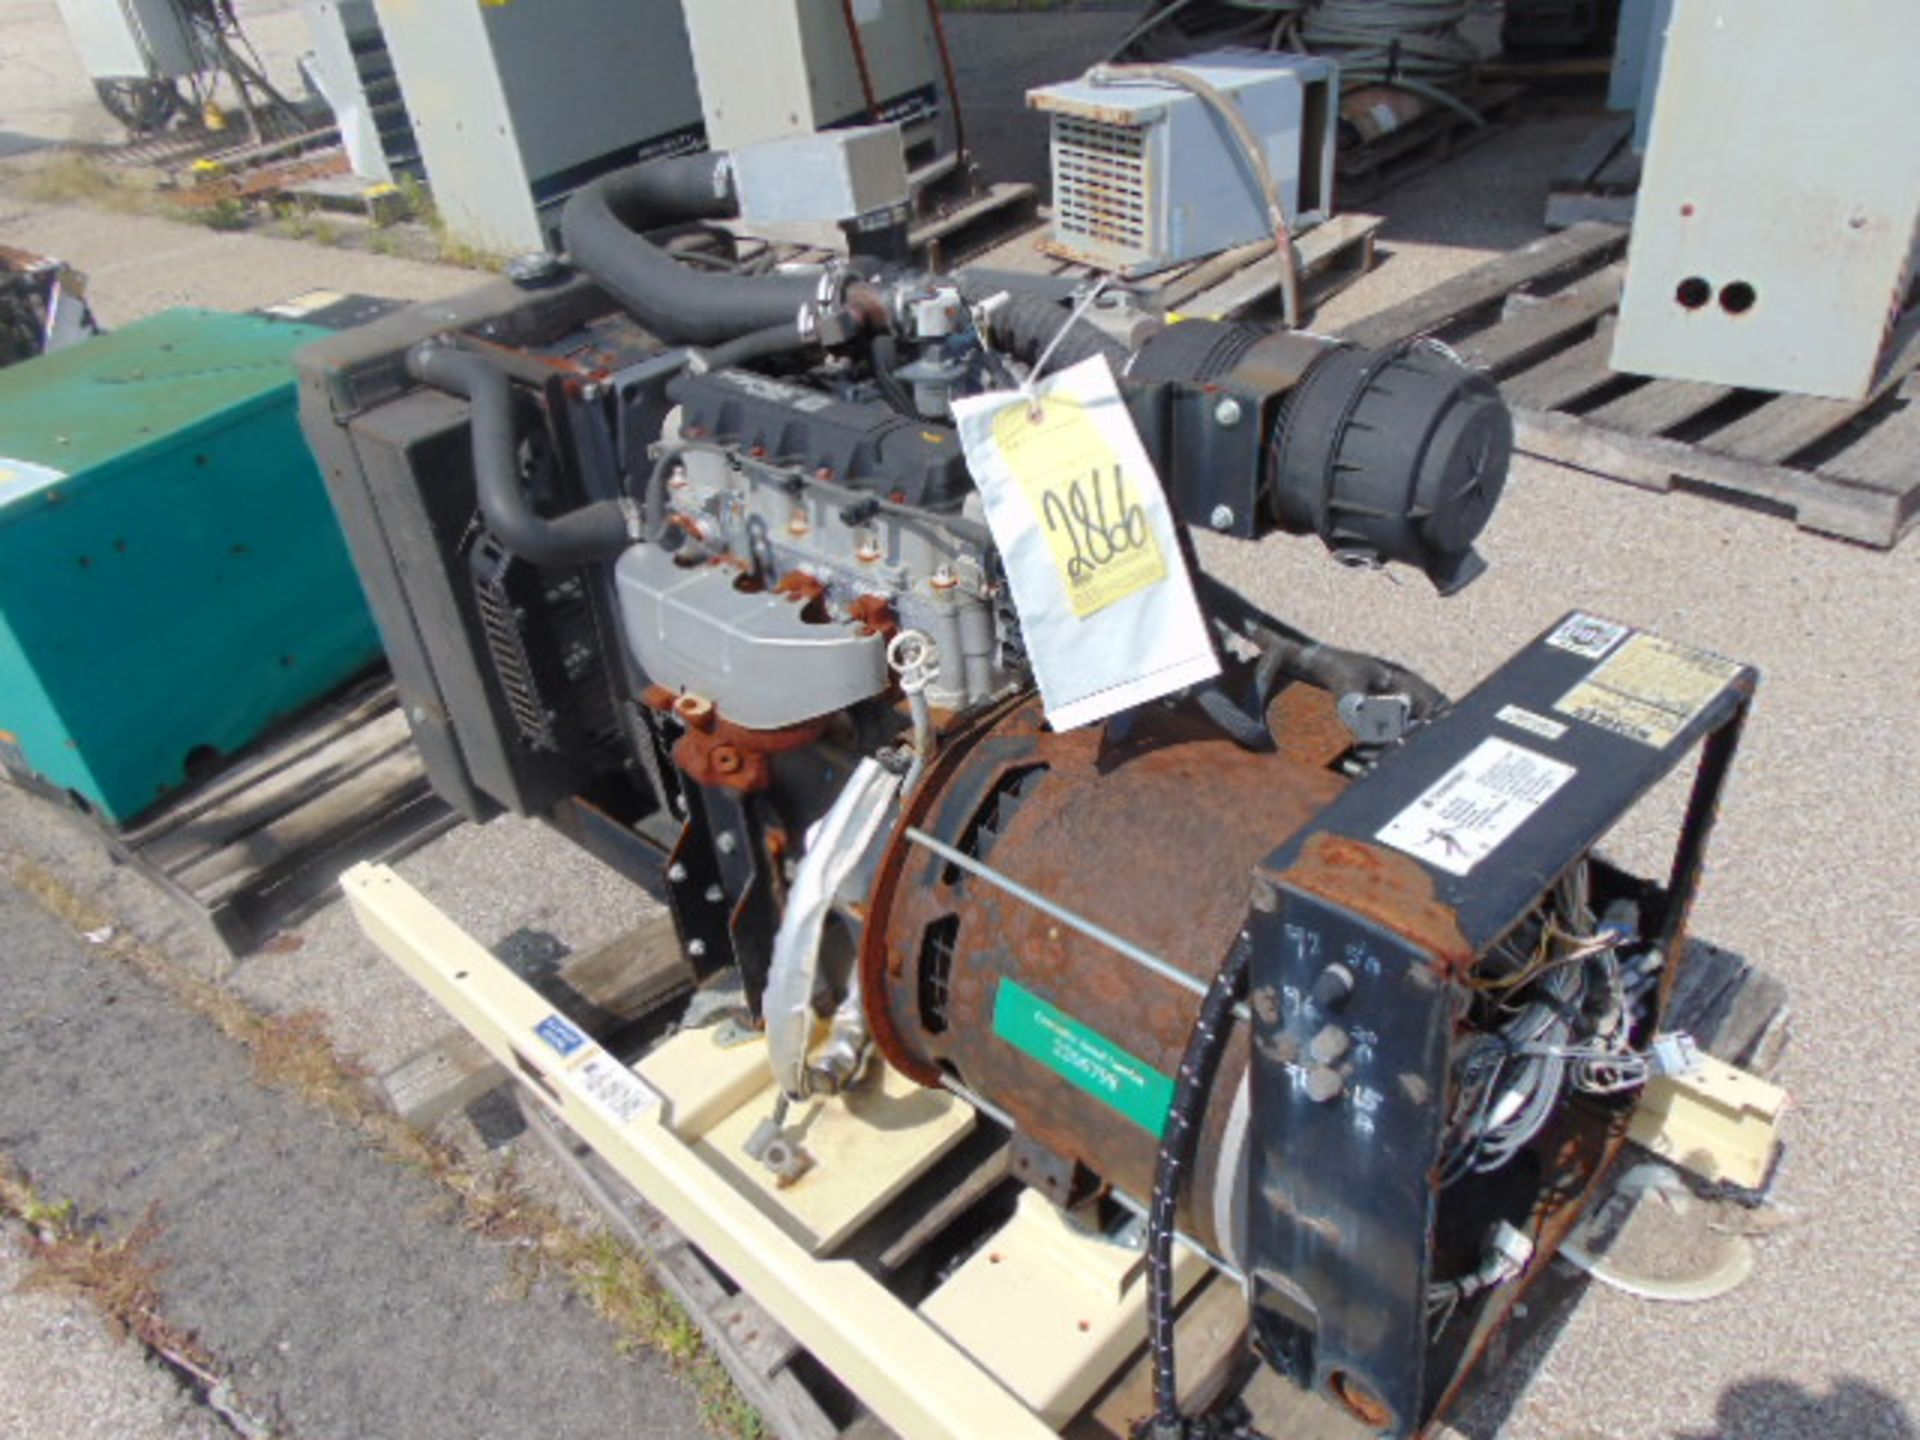 Lot 2866 - GENERATOR, KOHLER MDL. 30RYG, G.M. Vortex 1600 gasoline pwrd. engine